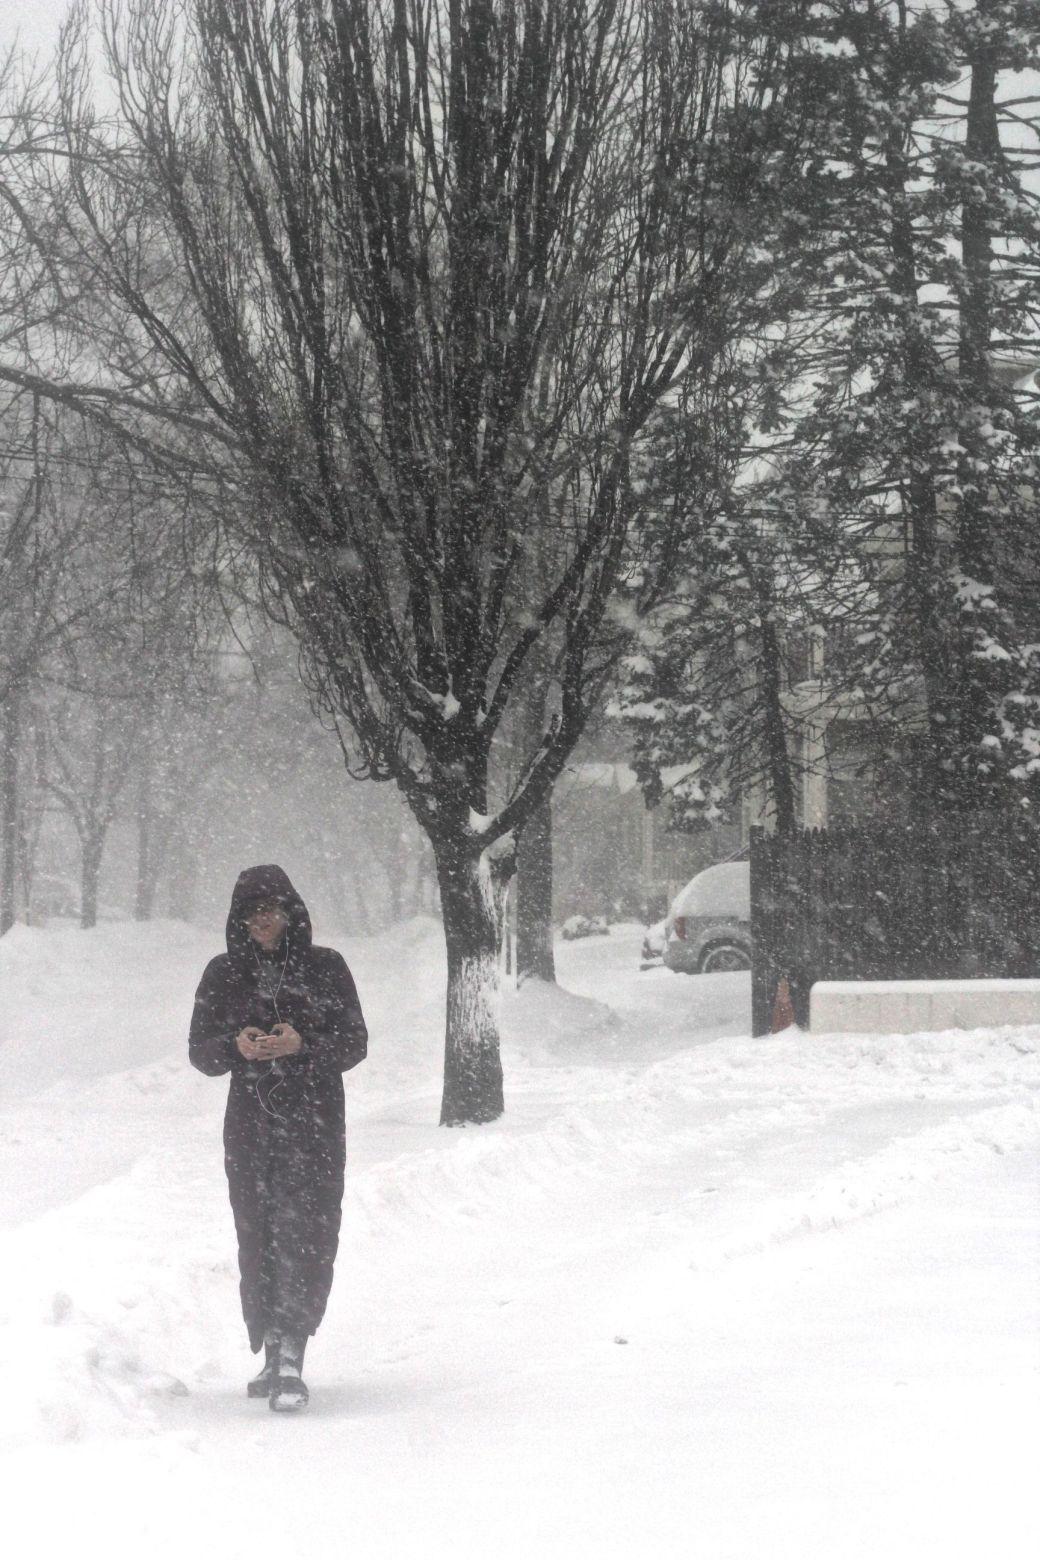 boston-snow-storm-february-9-2017-26